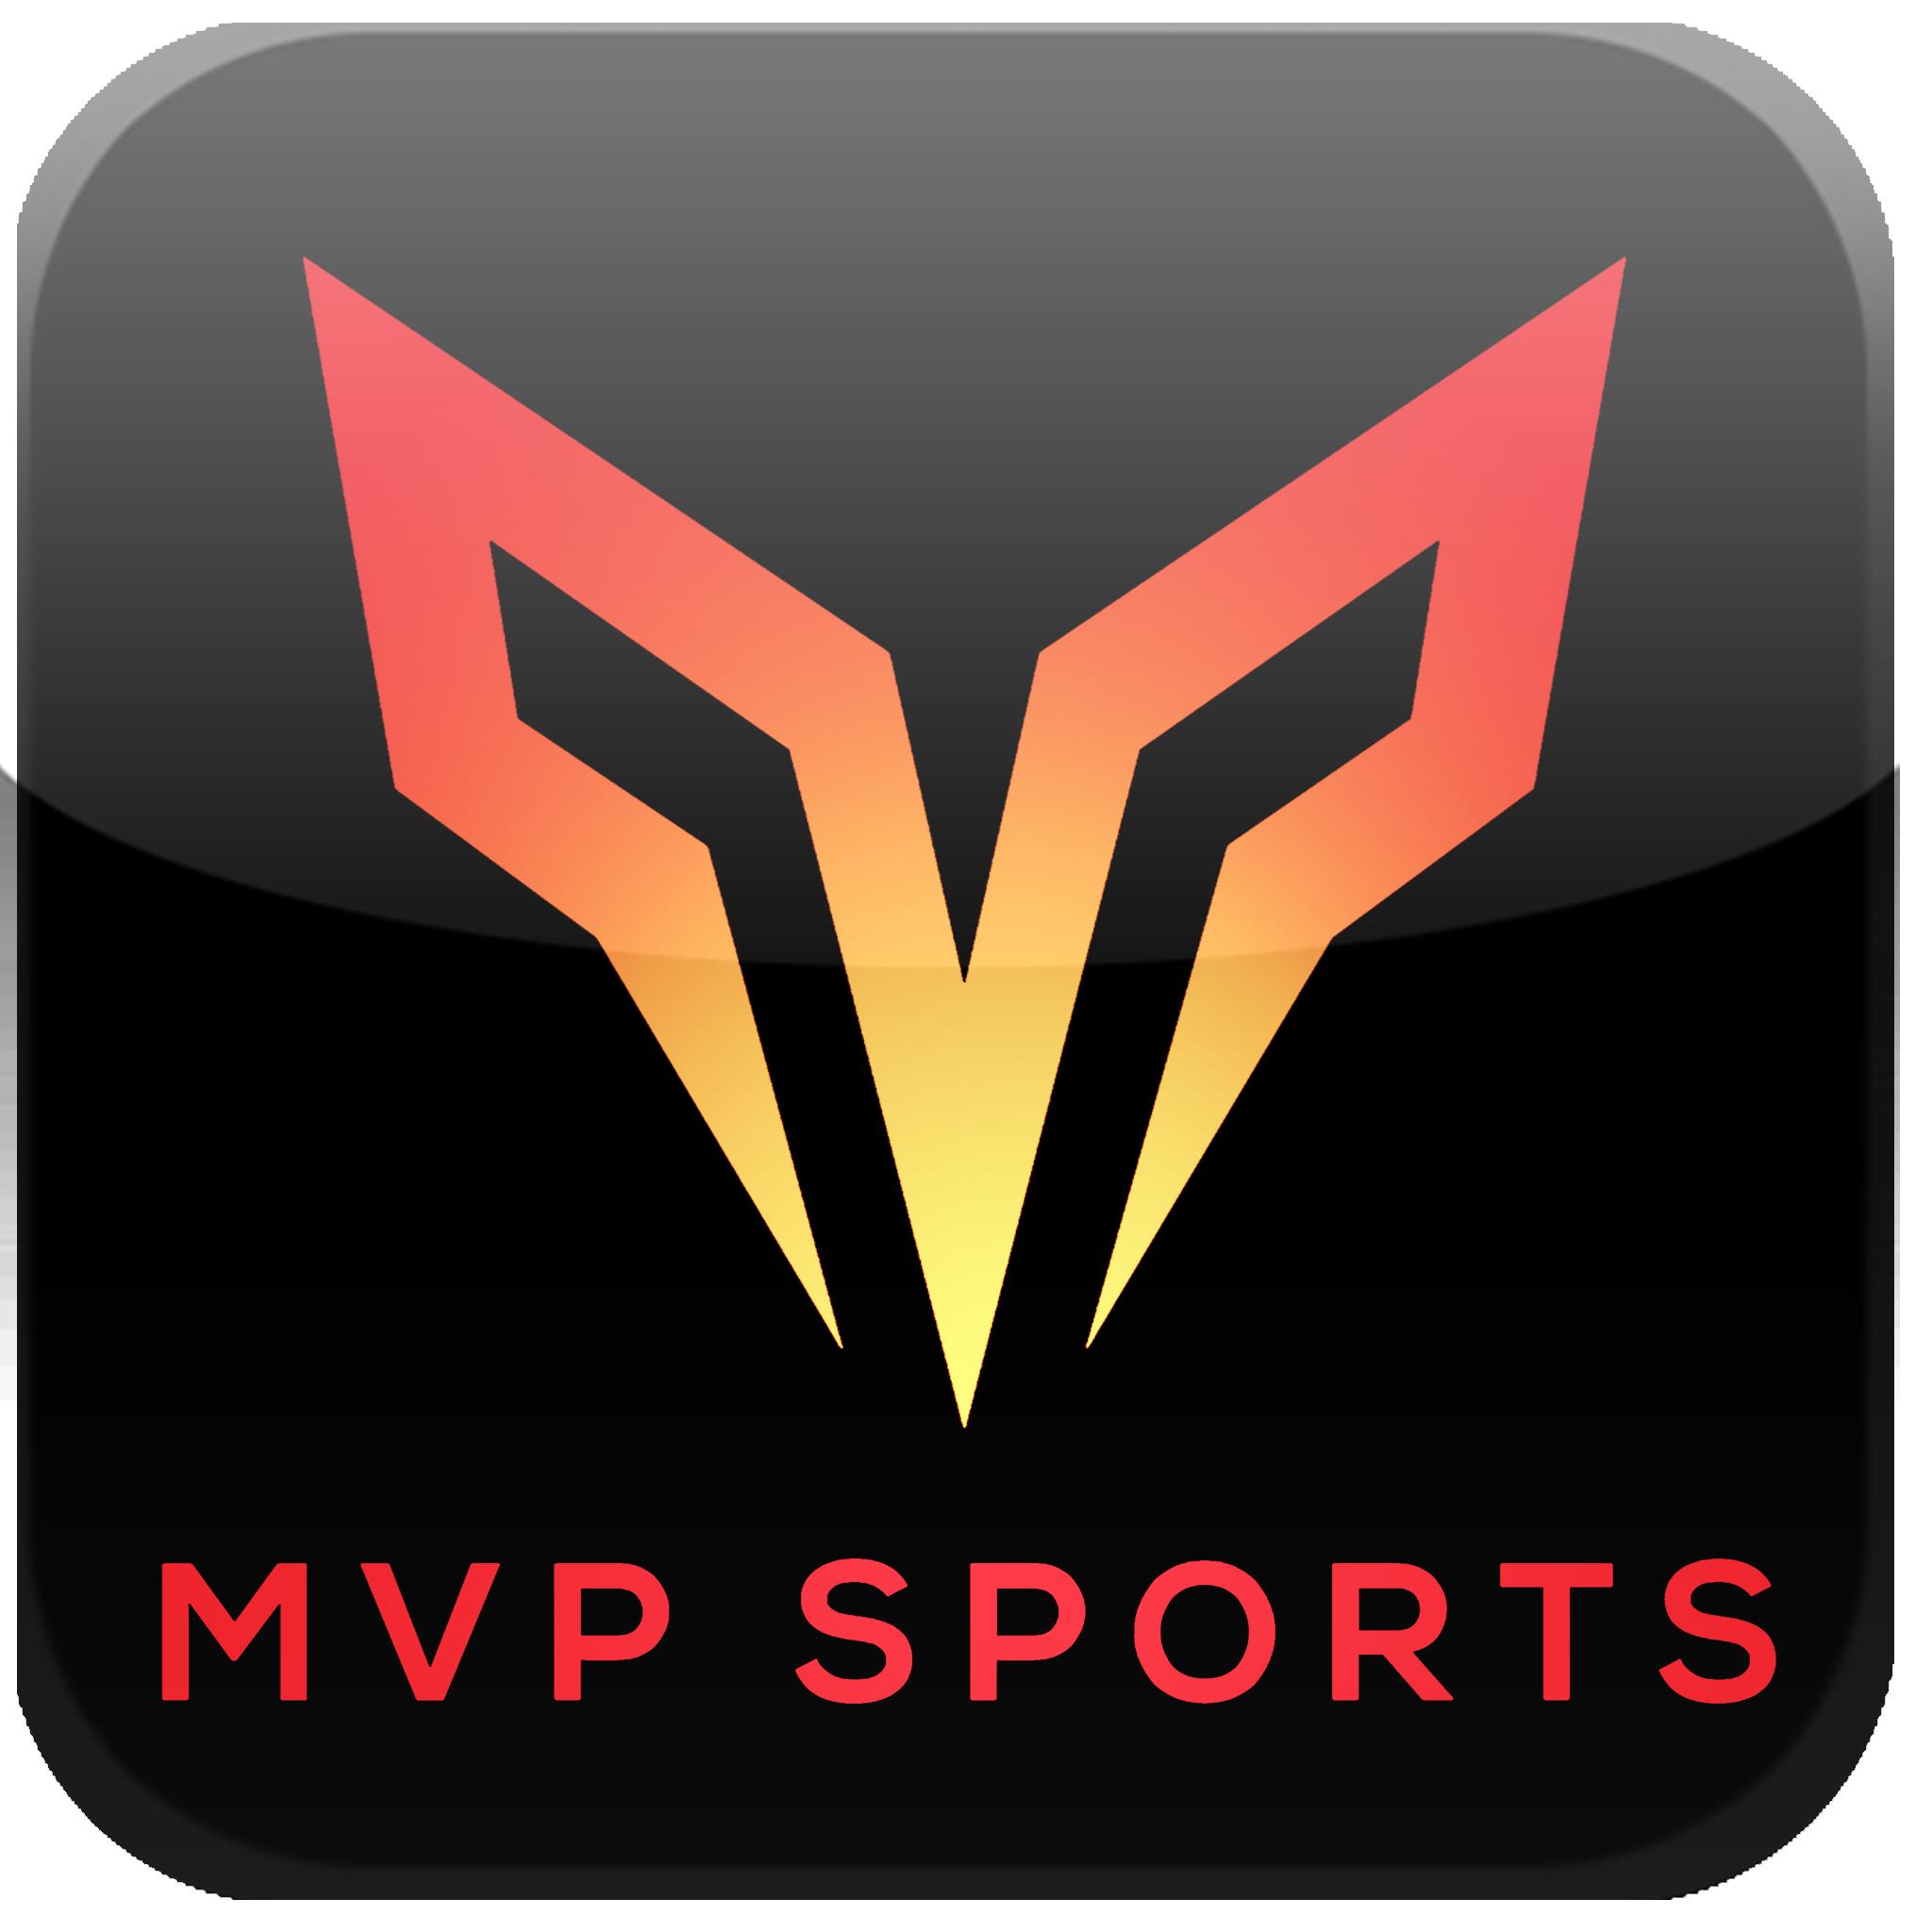 MVP SPORTS INC